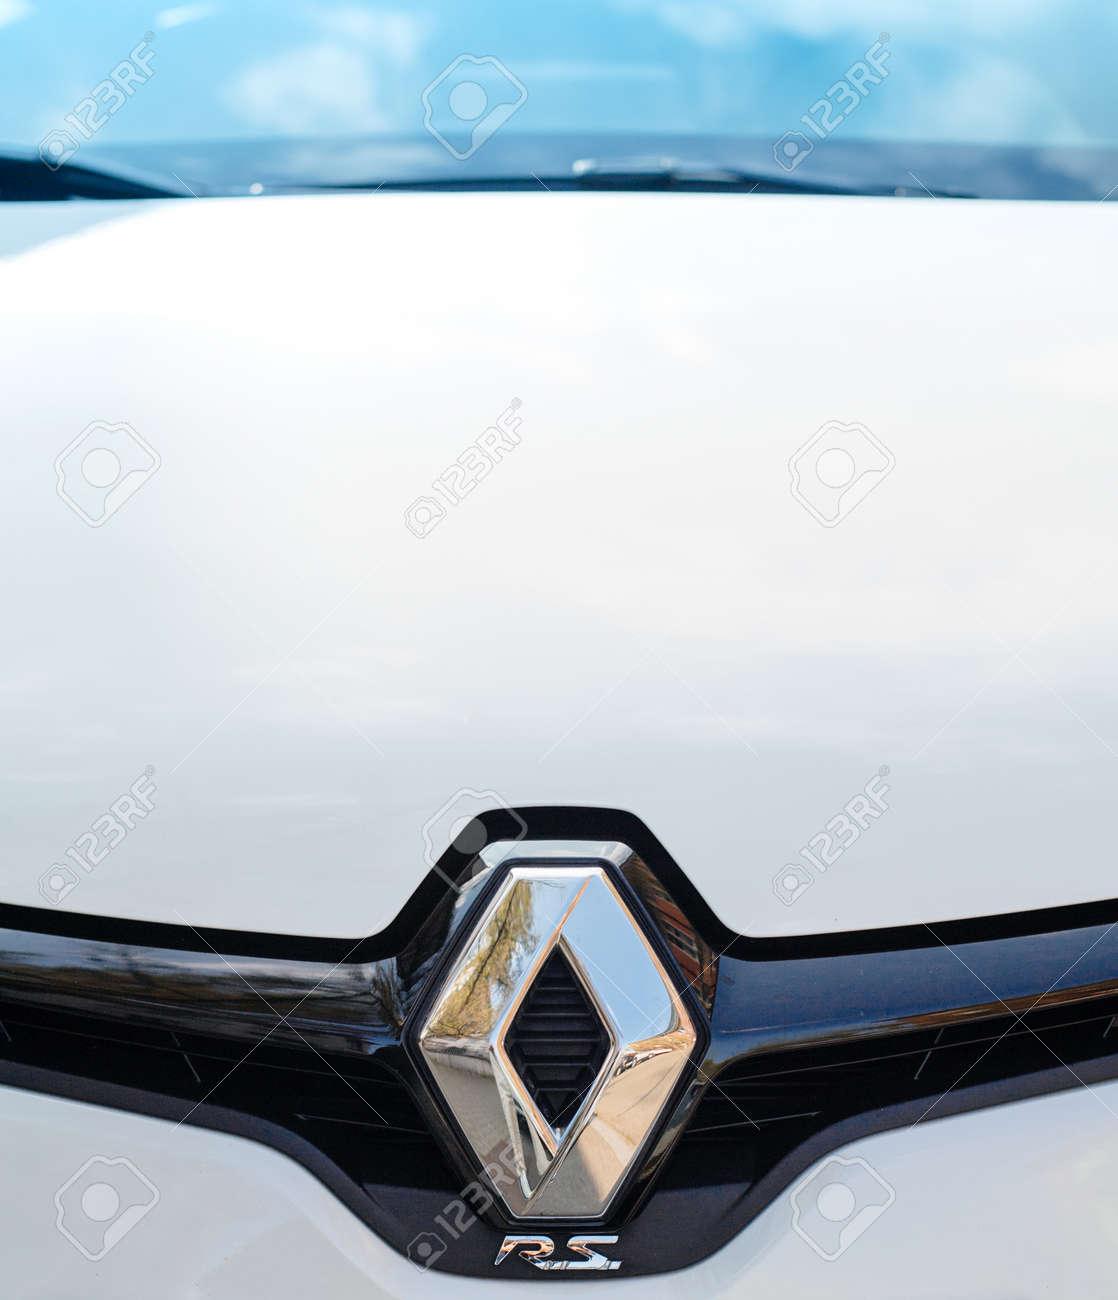 Paris France Apr 3 2017 Renault Rs Logo On A Luxury Sport